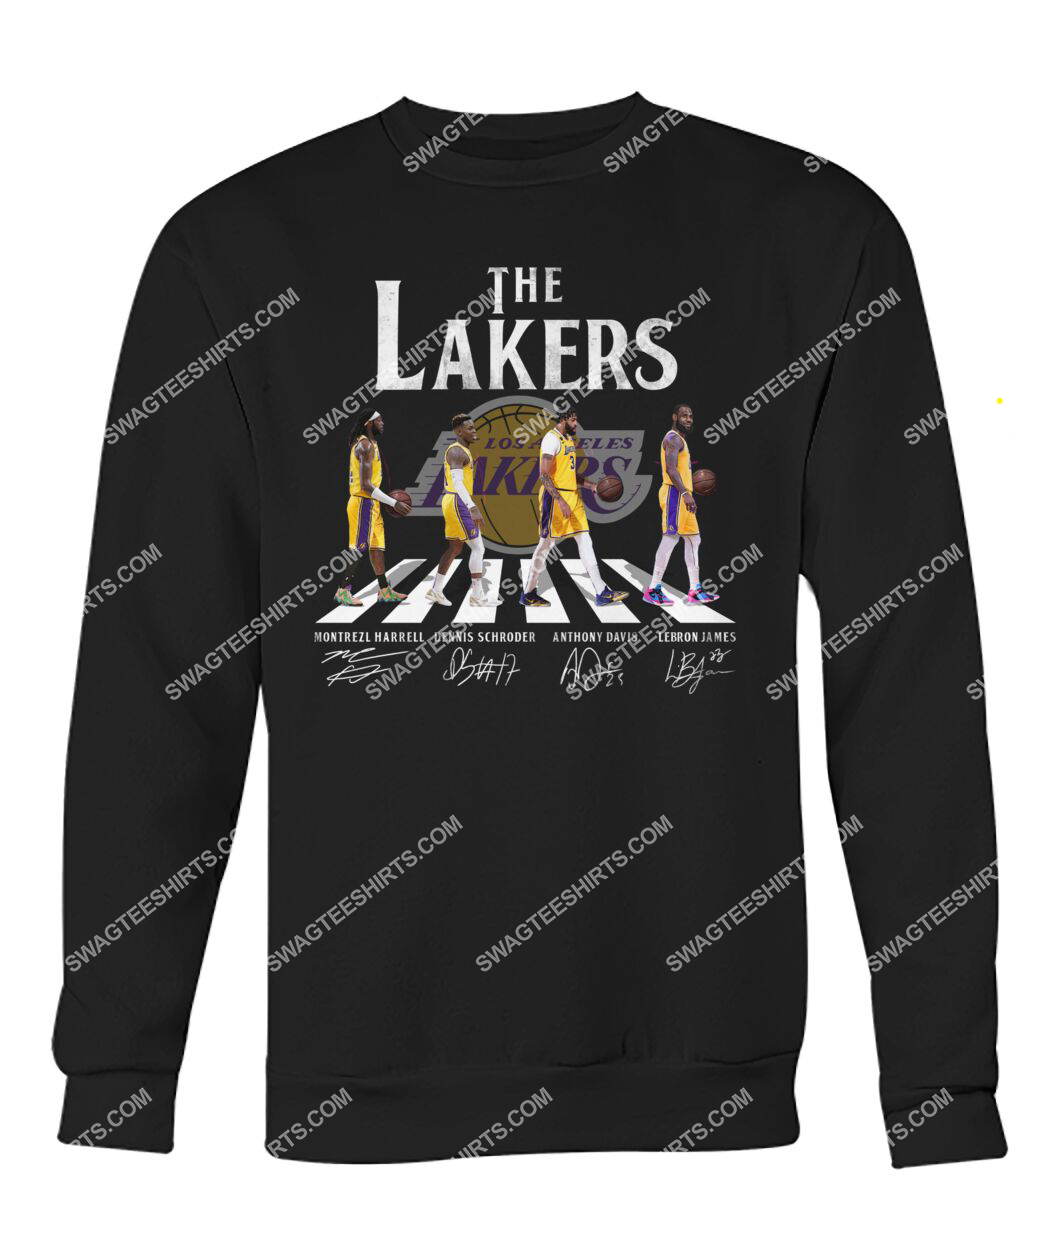 the los angeles lakers walking abbey road sweatshirt 1